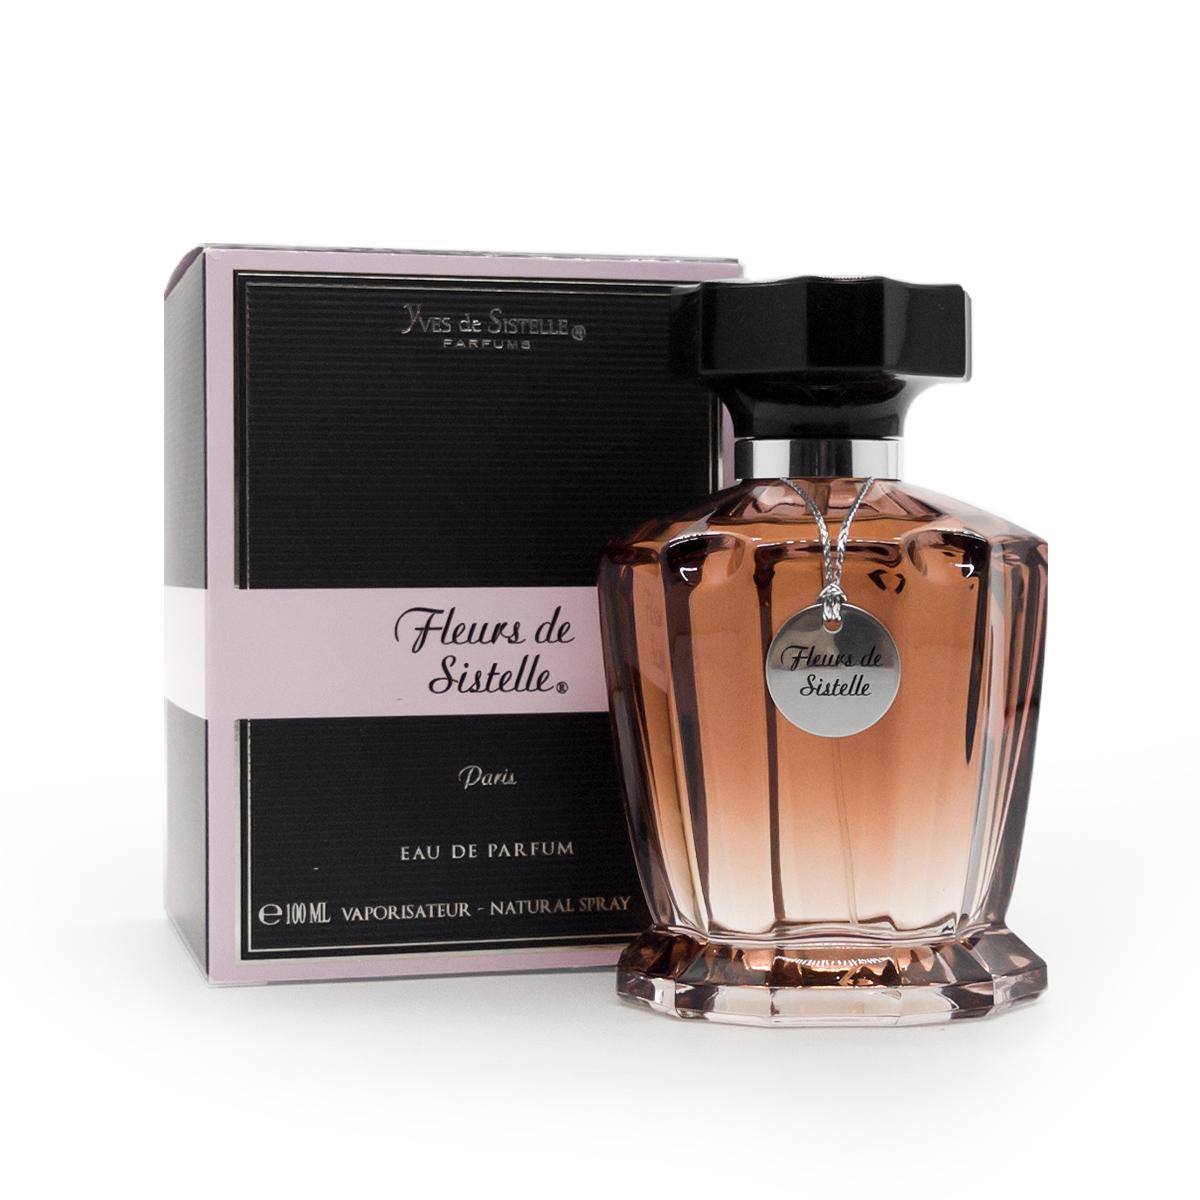 Perfume Fleurs de Sistelle Feminino Edp 100ml Paris Bleu